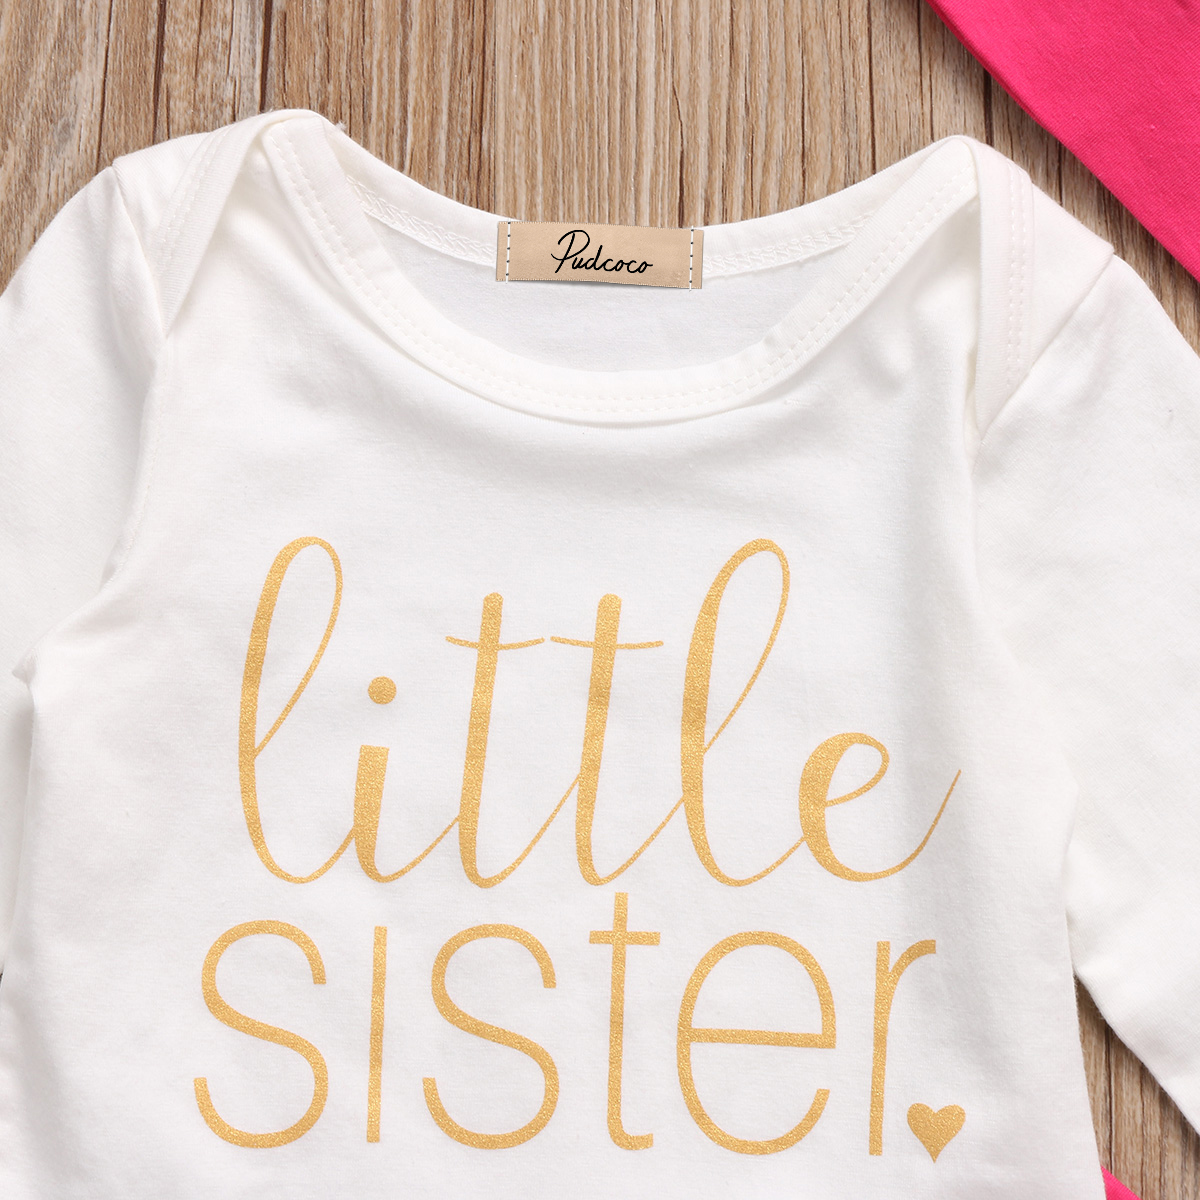 PUDCOCO Brand Clothes Set Cute Newborn Baby Girls Cotton Fashion Tops Romper Pants Hat 3Pcs Outfits Set Clothes 0-18M